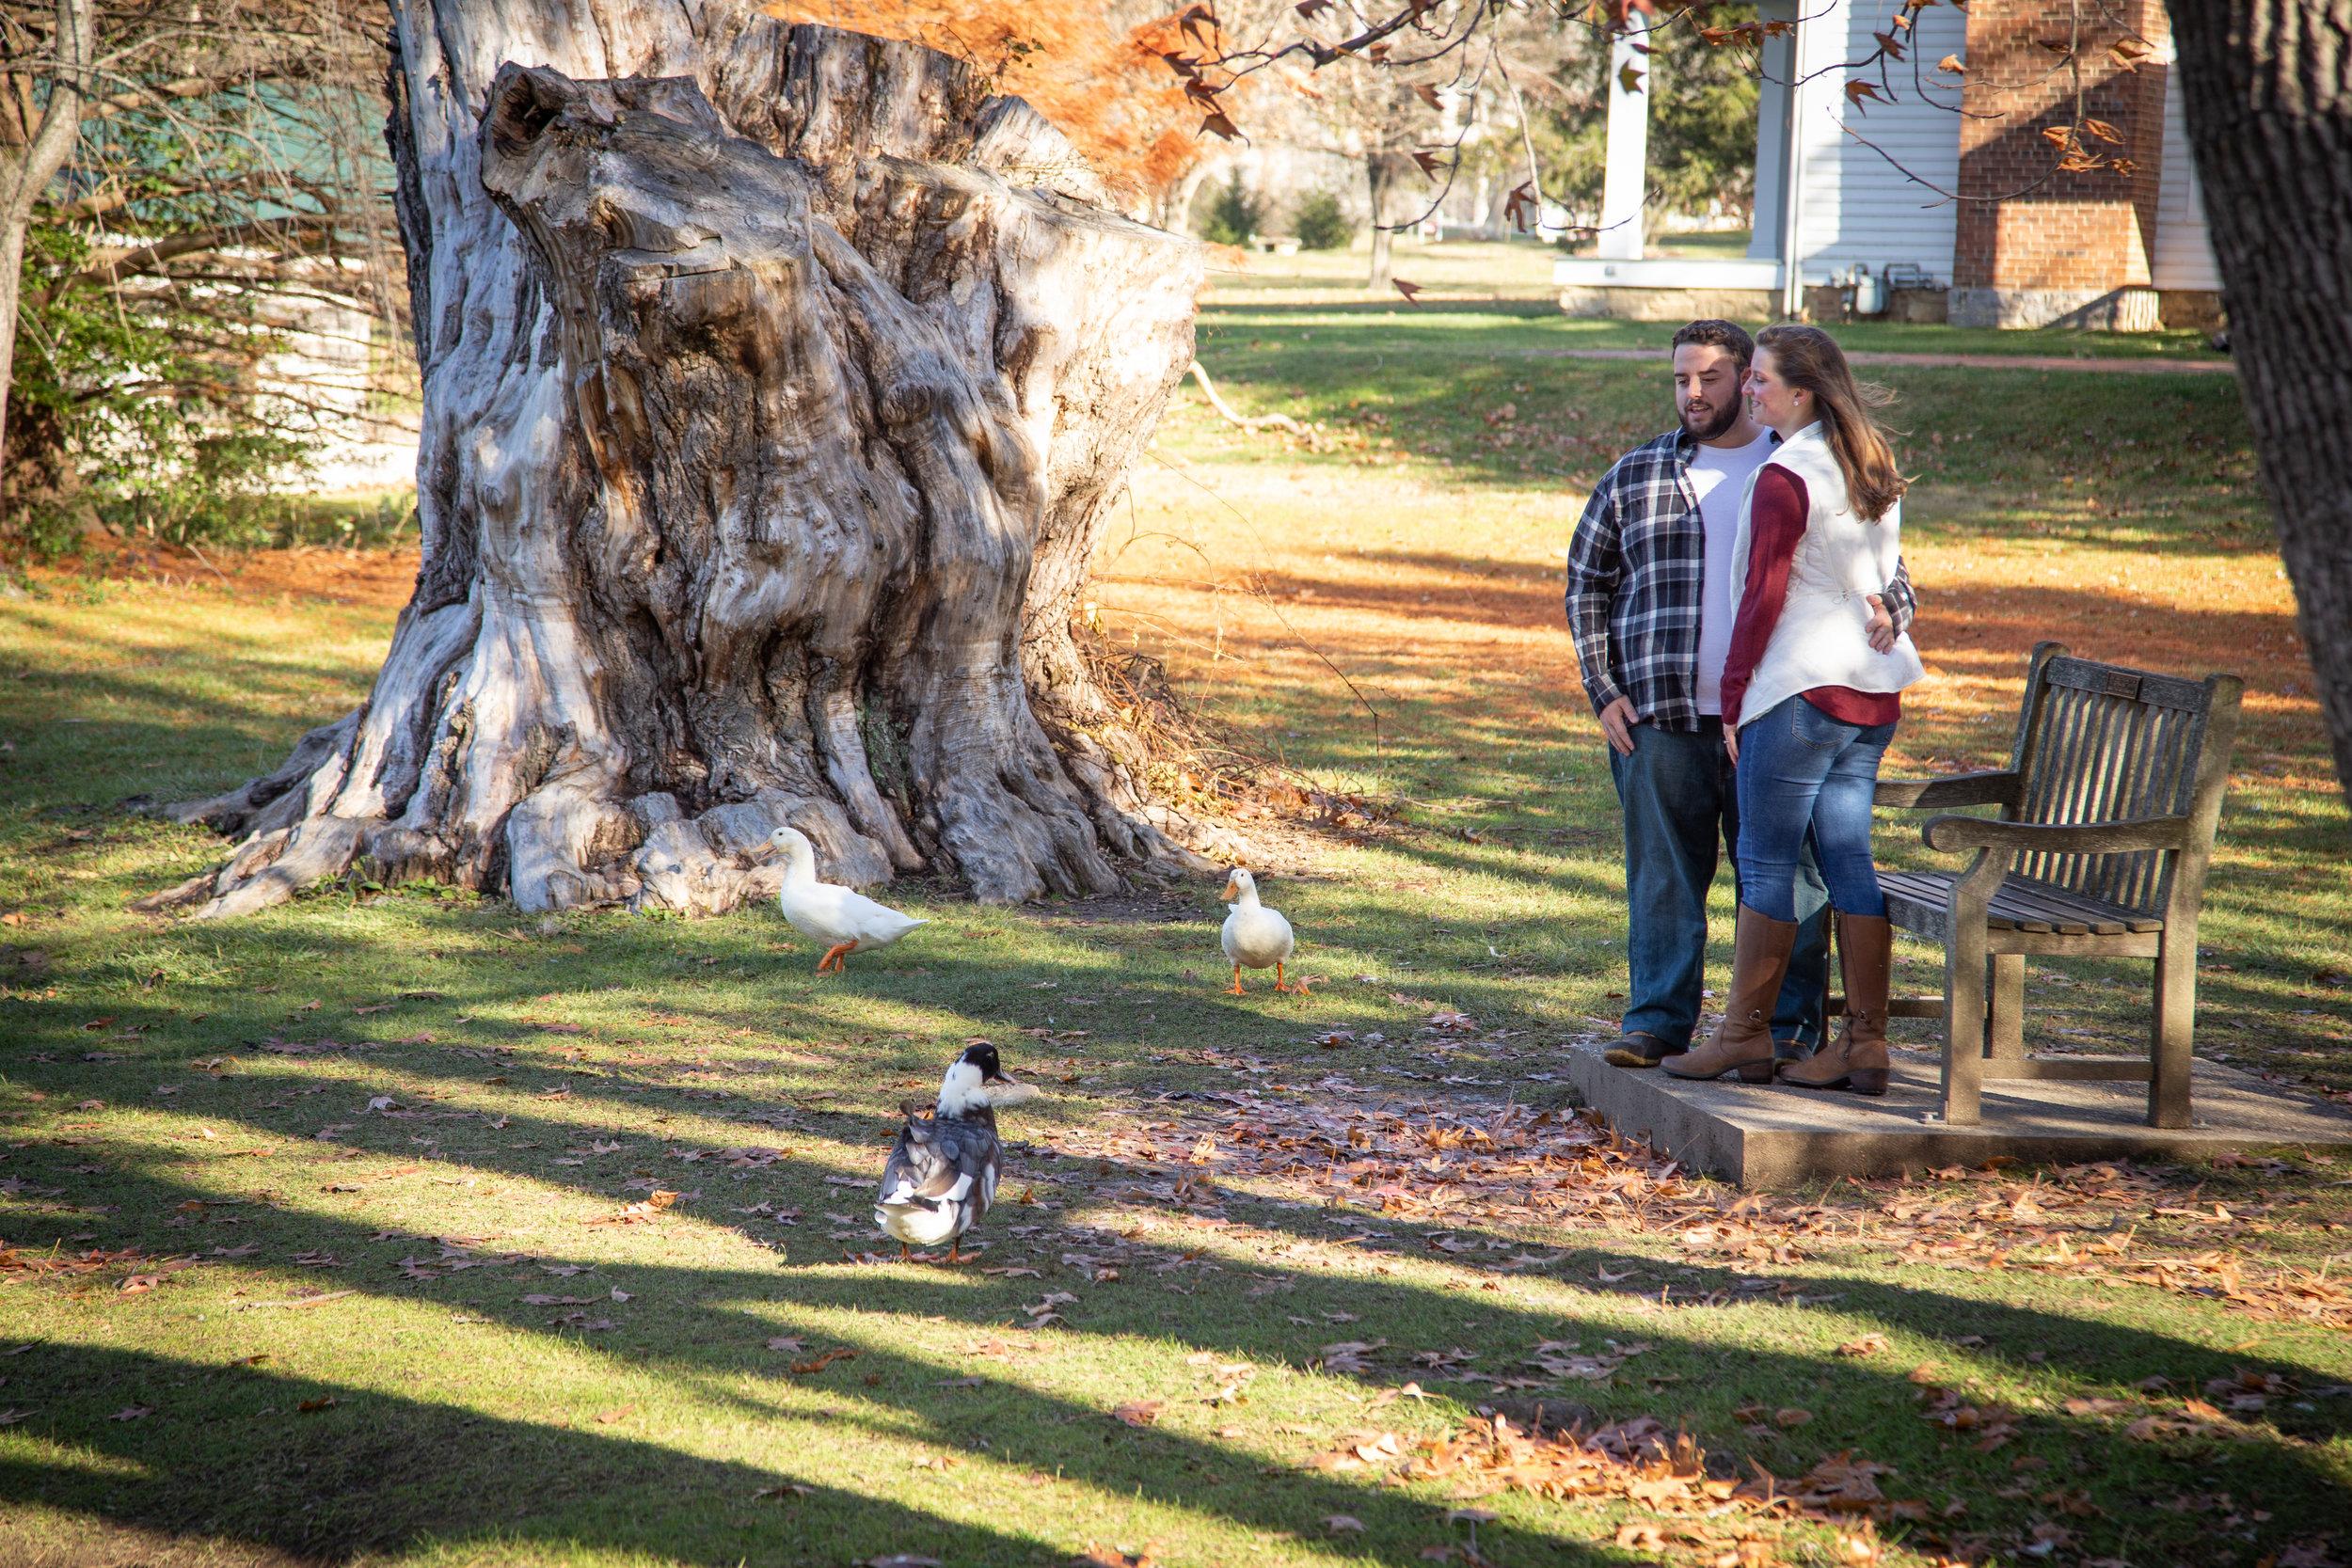 Fall-Laughing-together-bench-trees-duck-pond-virginia-tech-blacksburg-roanoke-engaged-warm-ducks-swarm